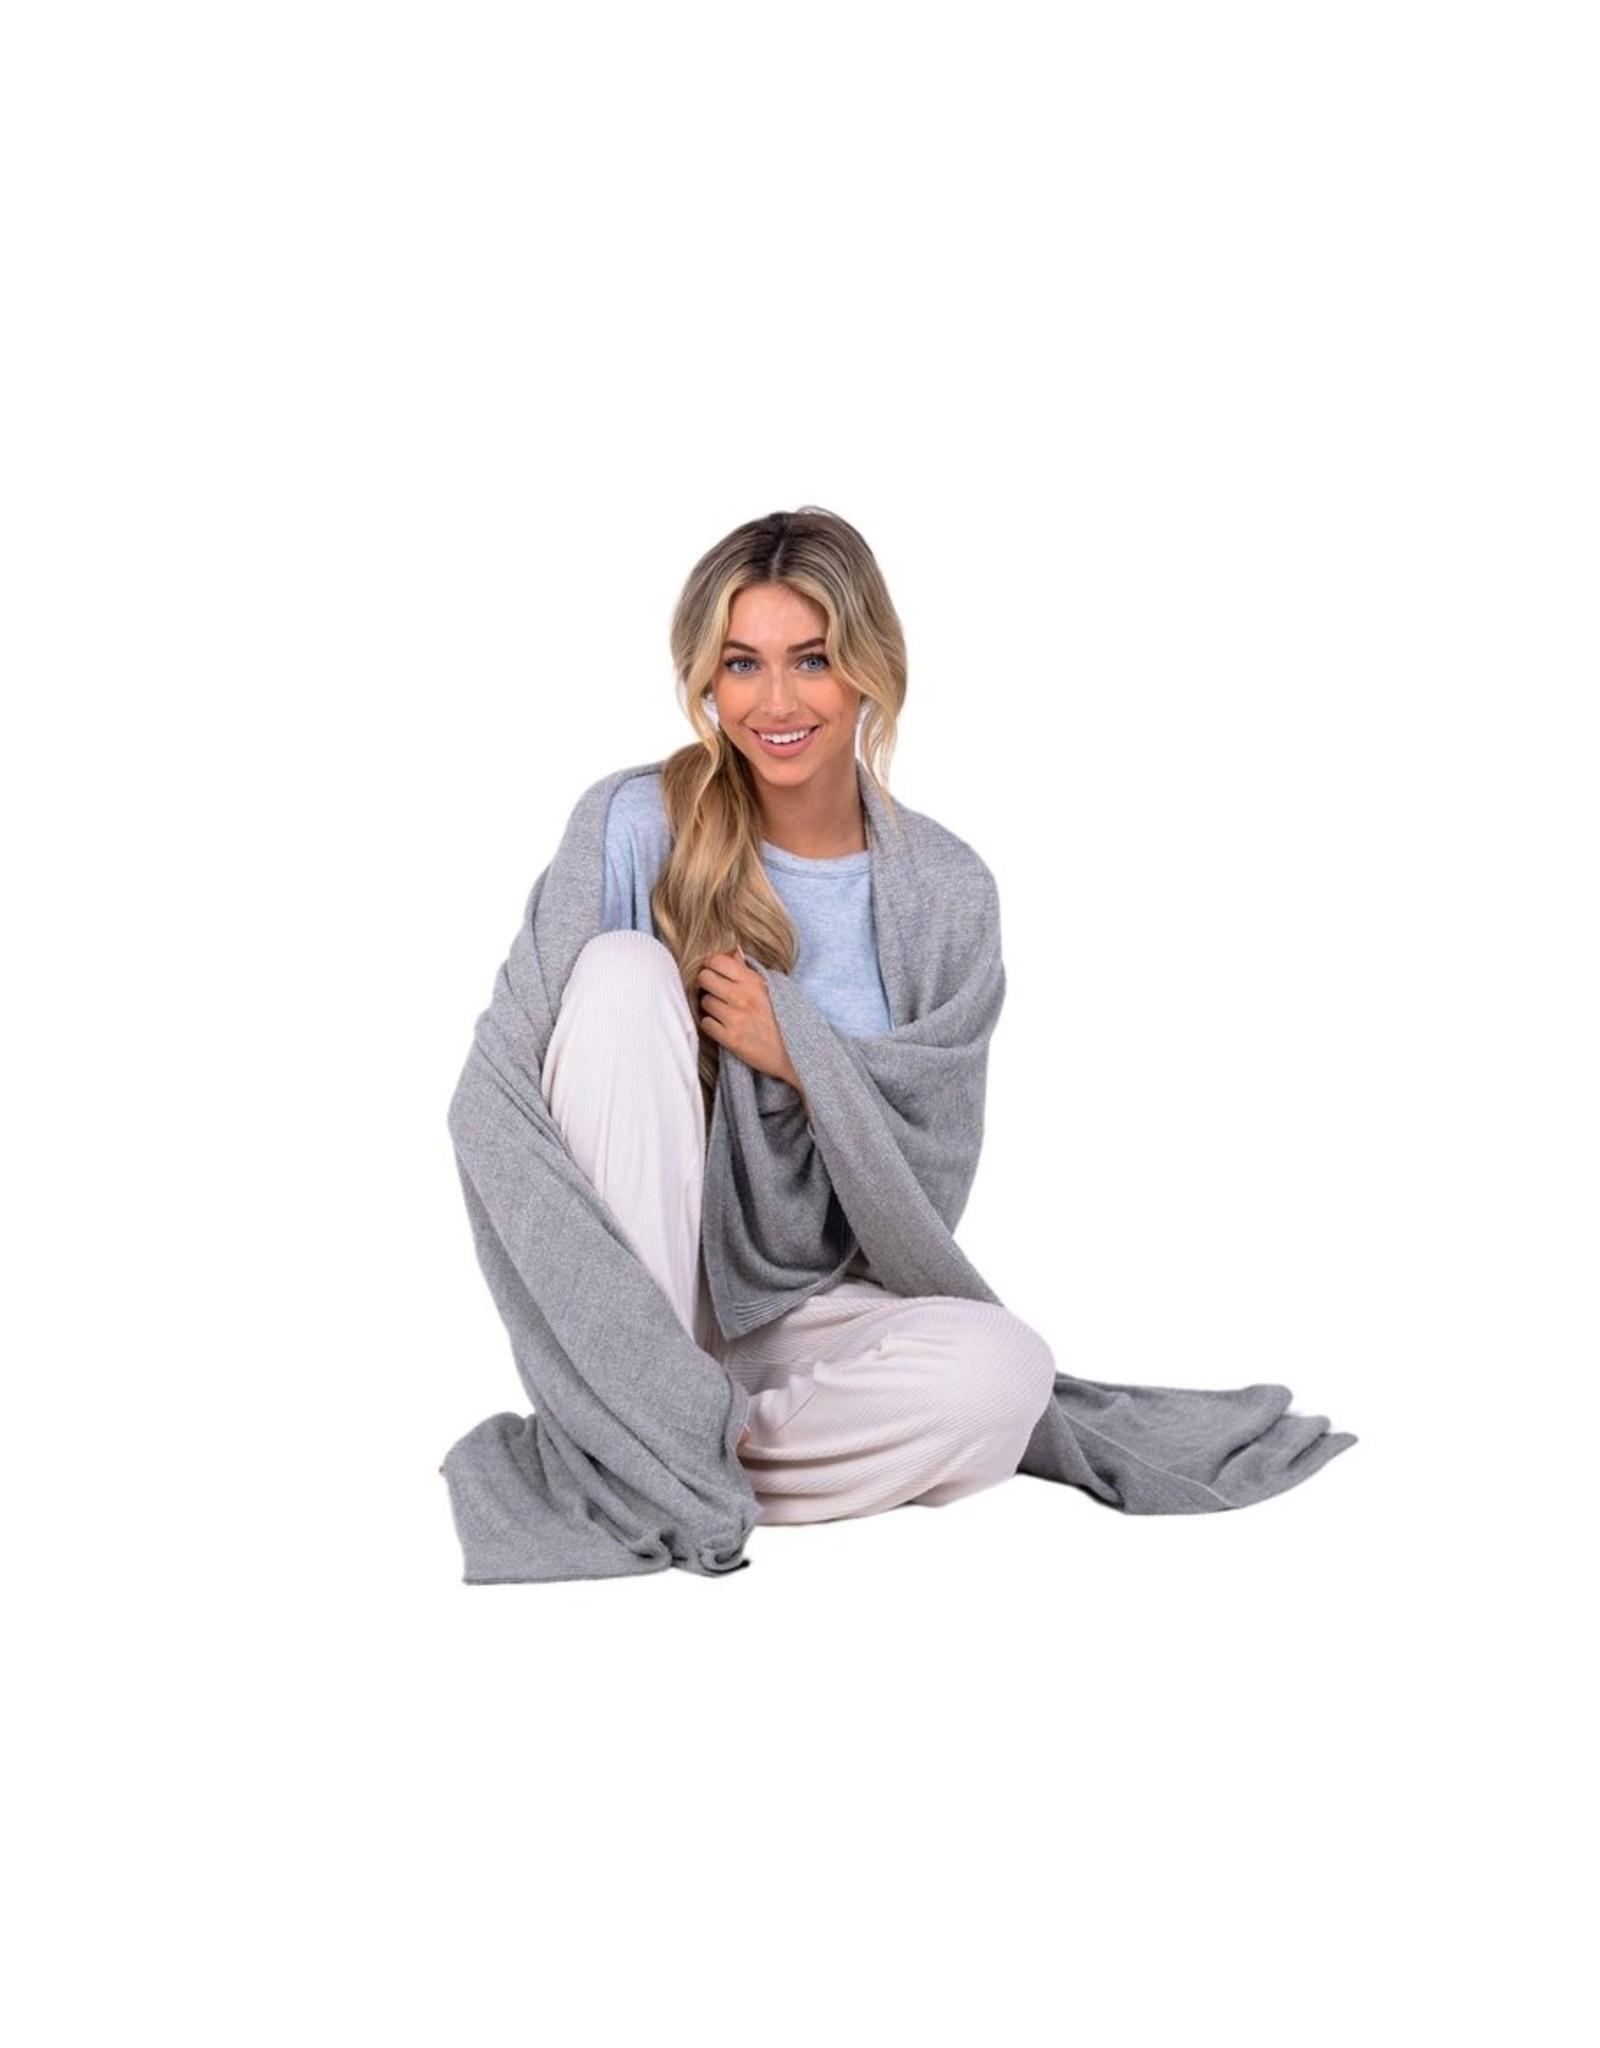 Southern Shirt Dreamluxe Blanket/2Z006